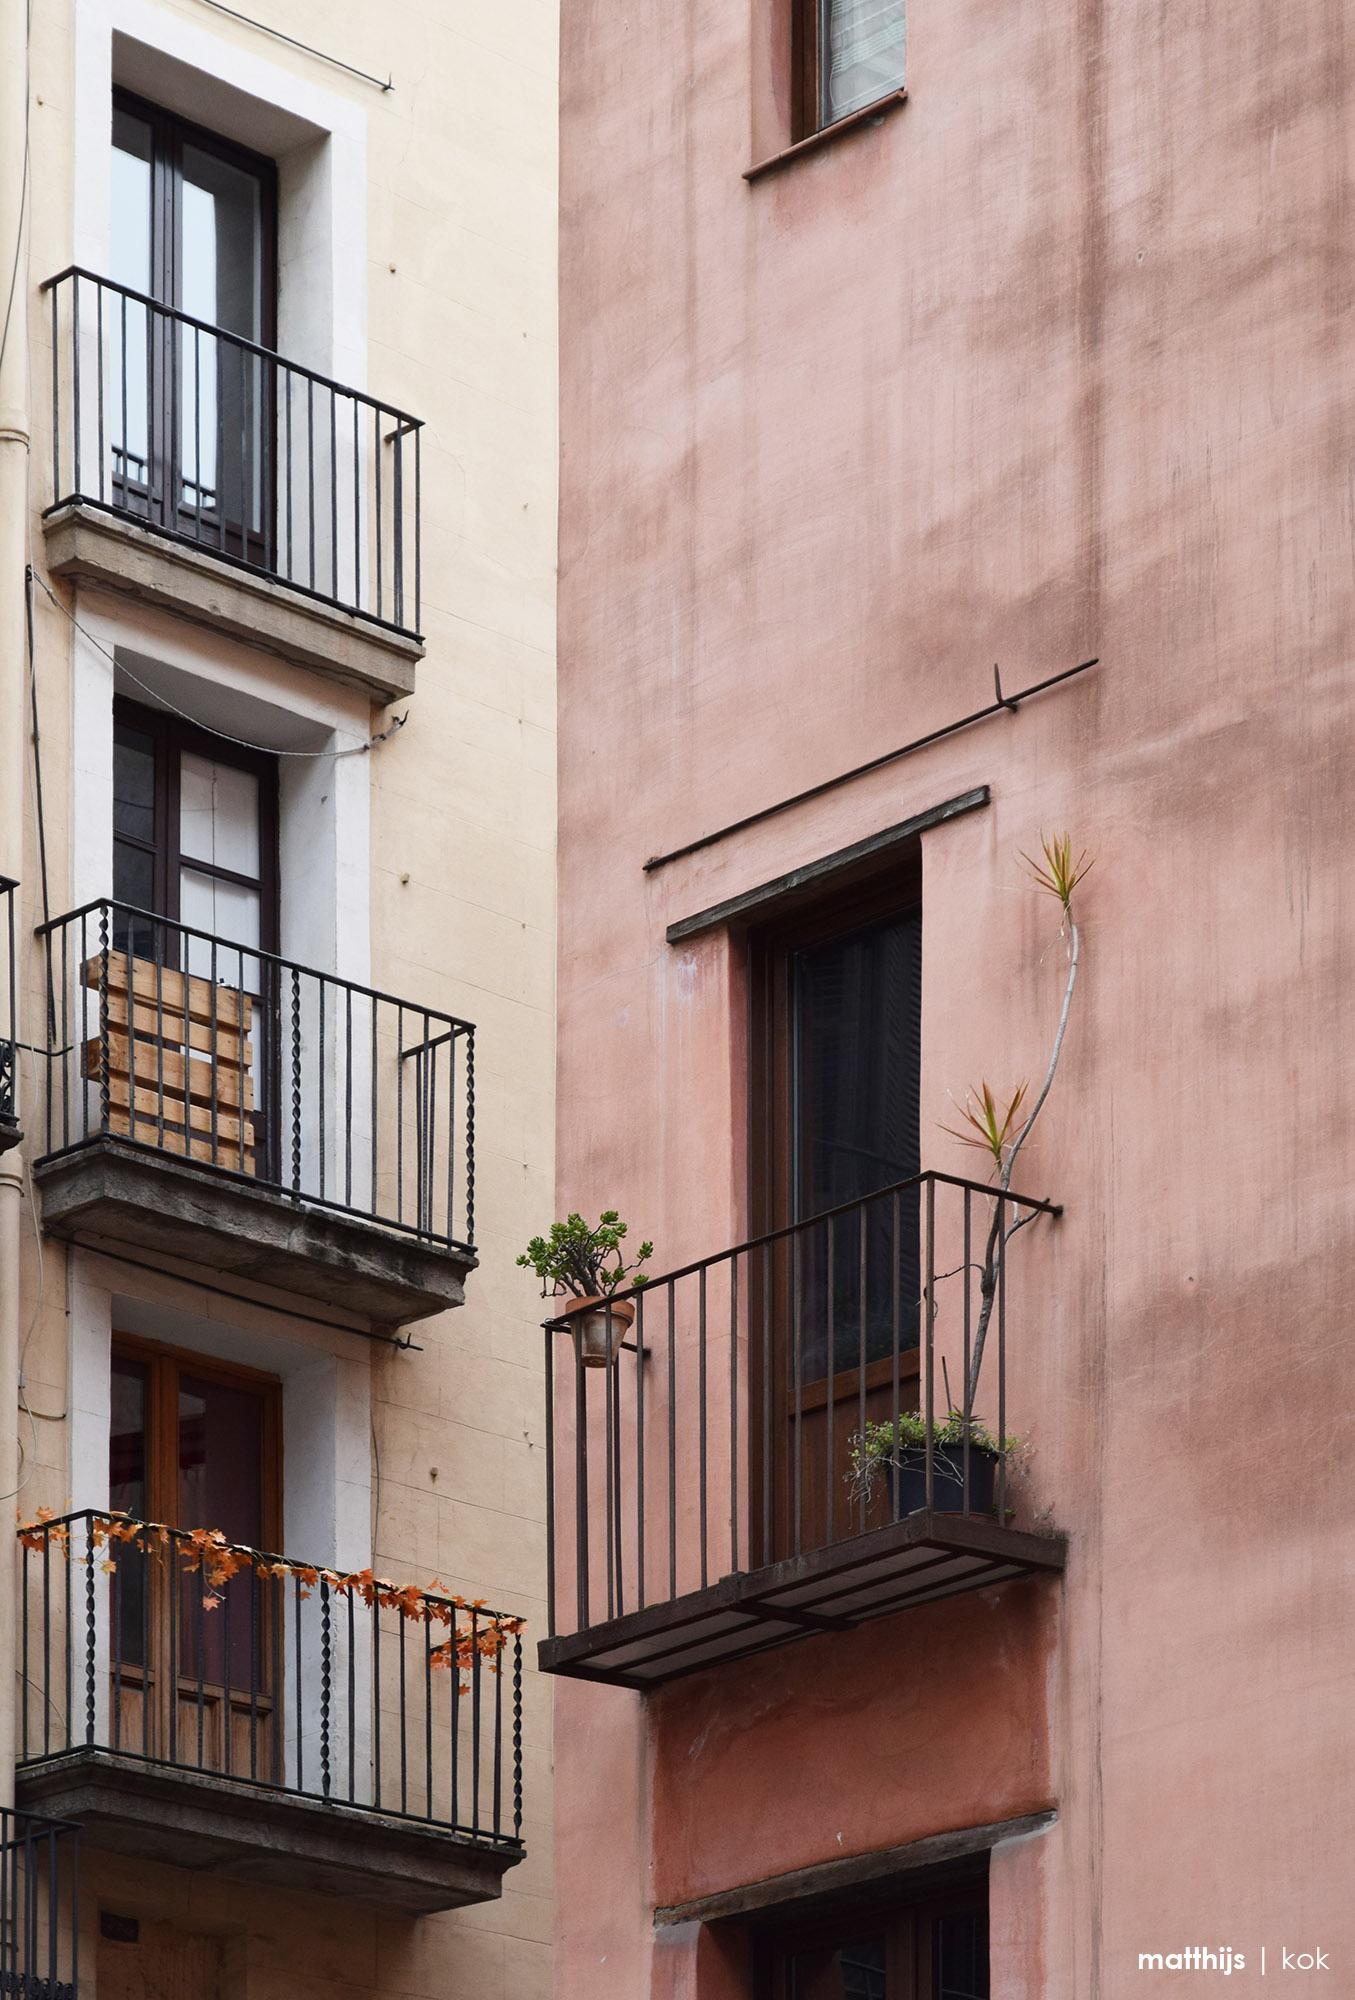 Barcelona Photo Essay, Photography by Matthijs Kok